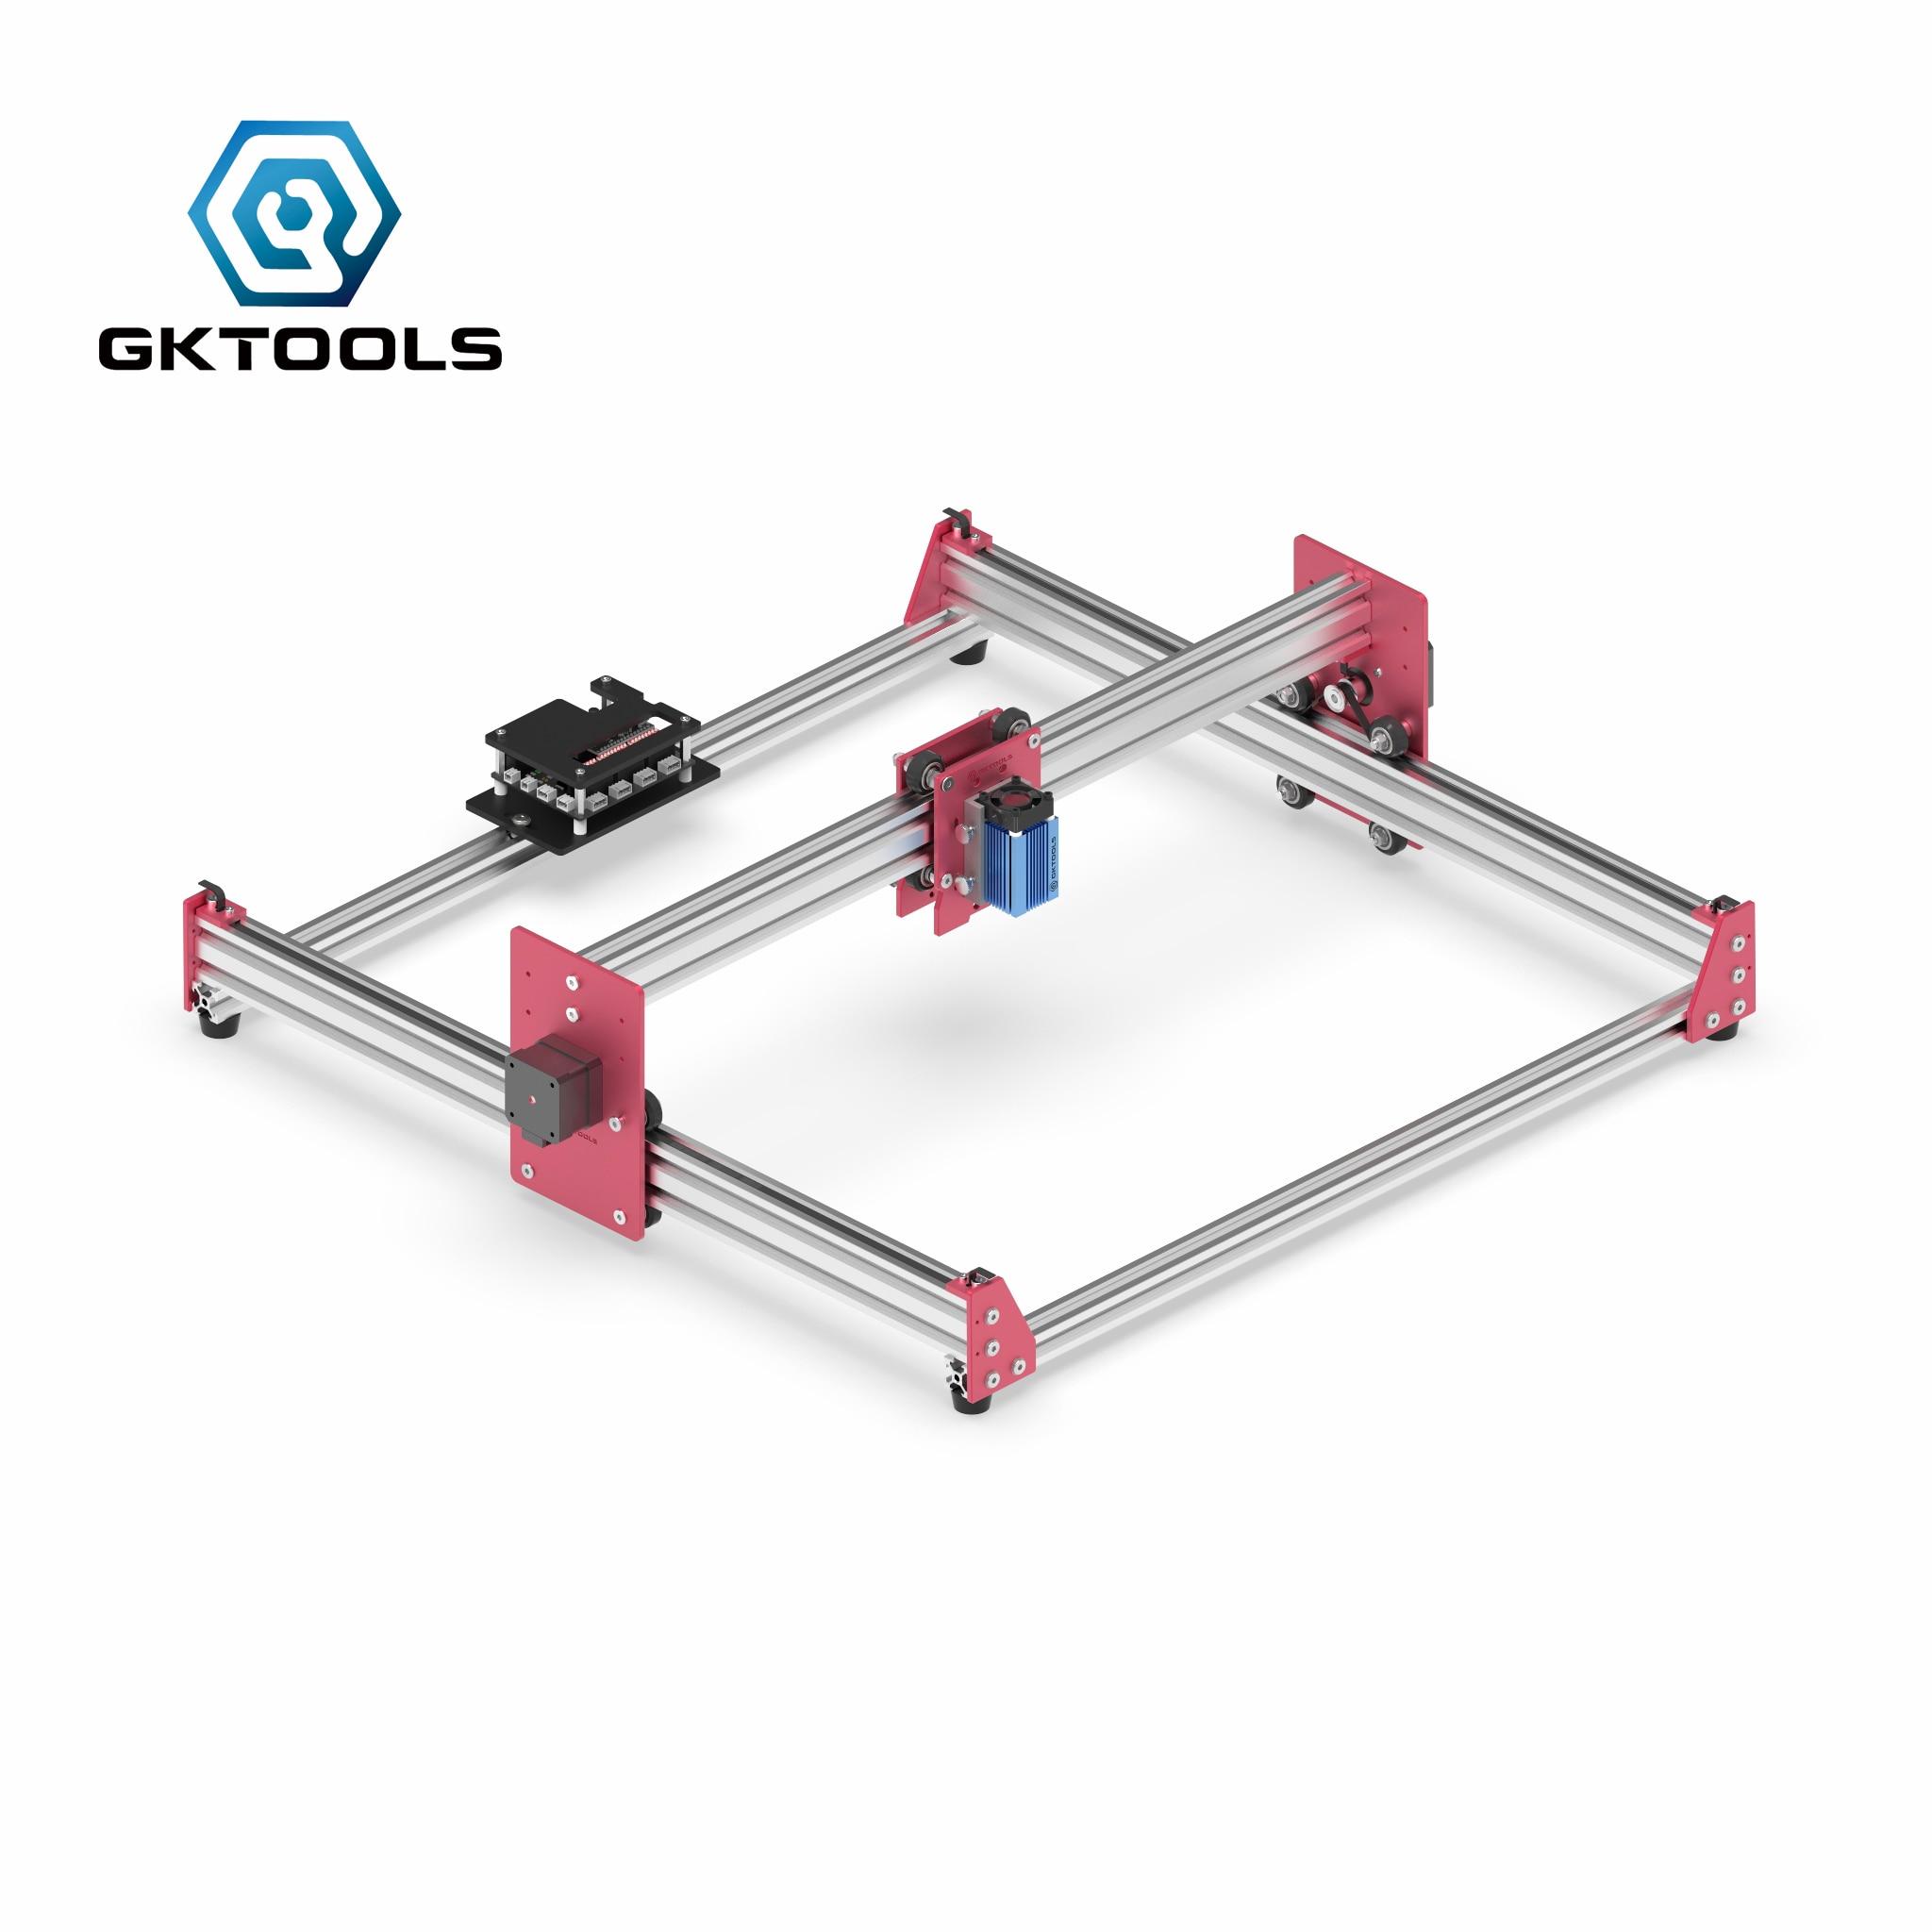 Лазерная тяга гравировки бесплатная доставка GK4545Pro 45*45 см мини 500/2500/5500/7500 МВт CNC машина